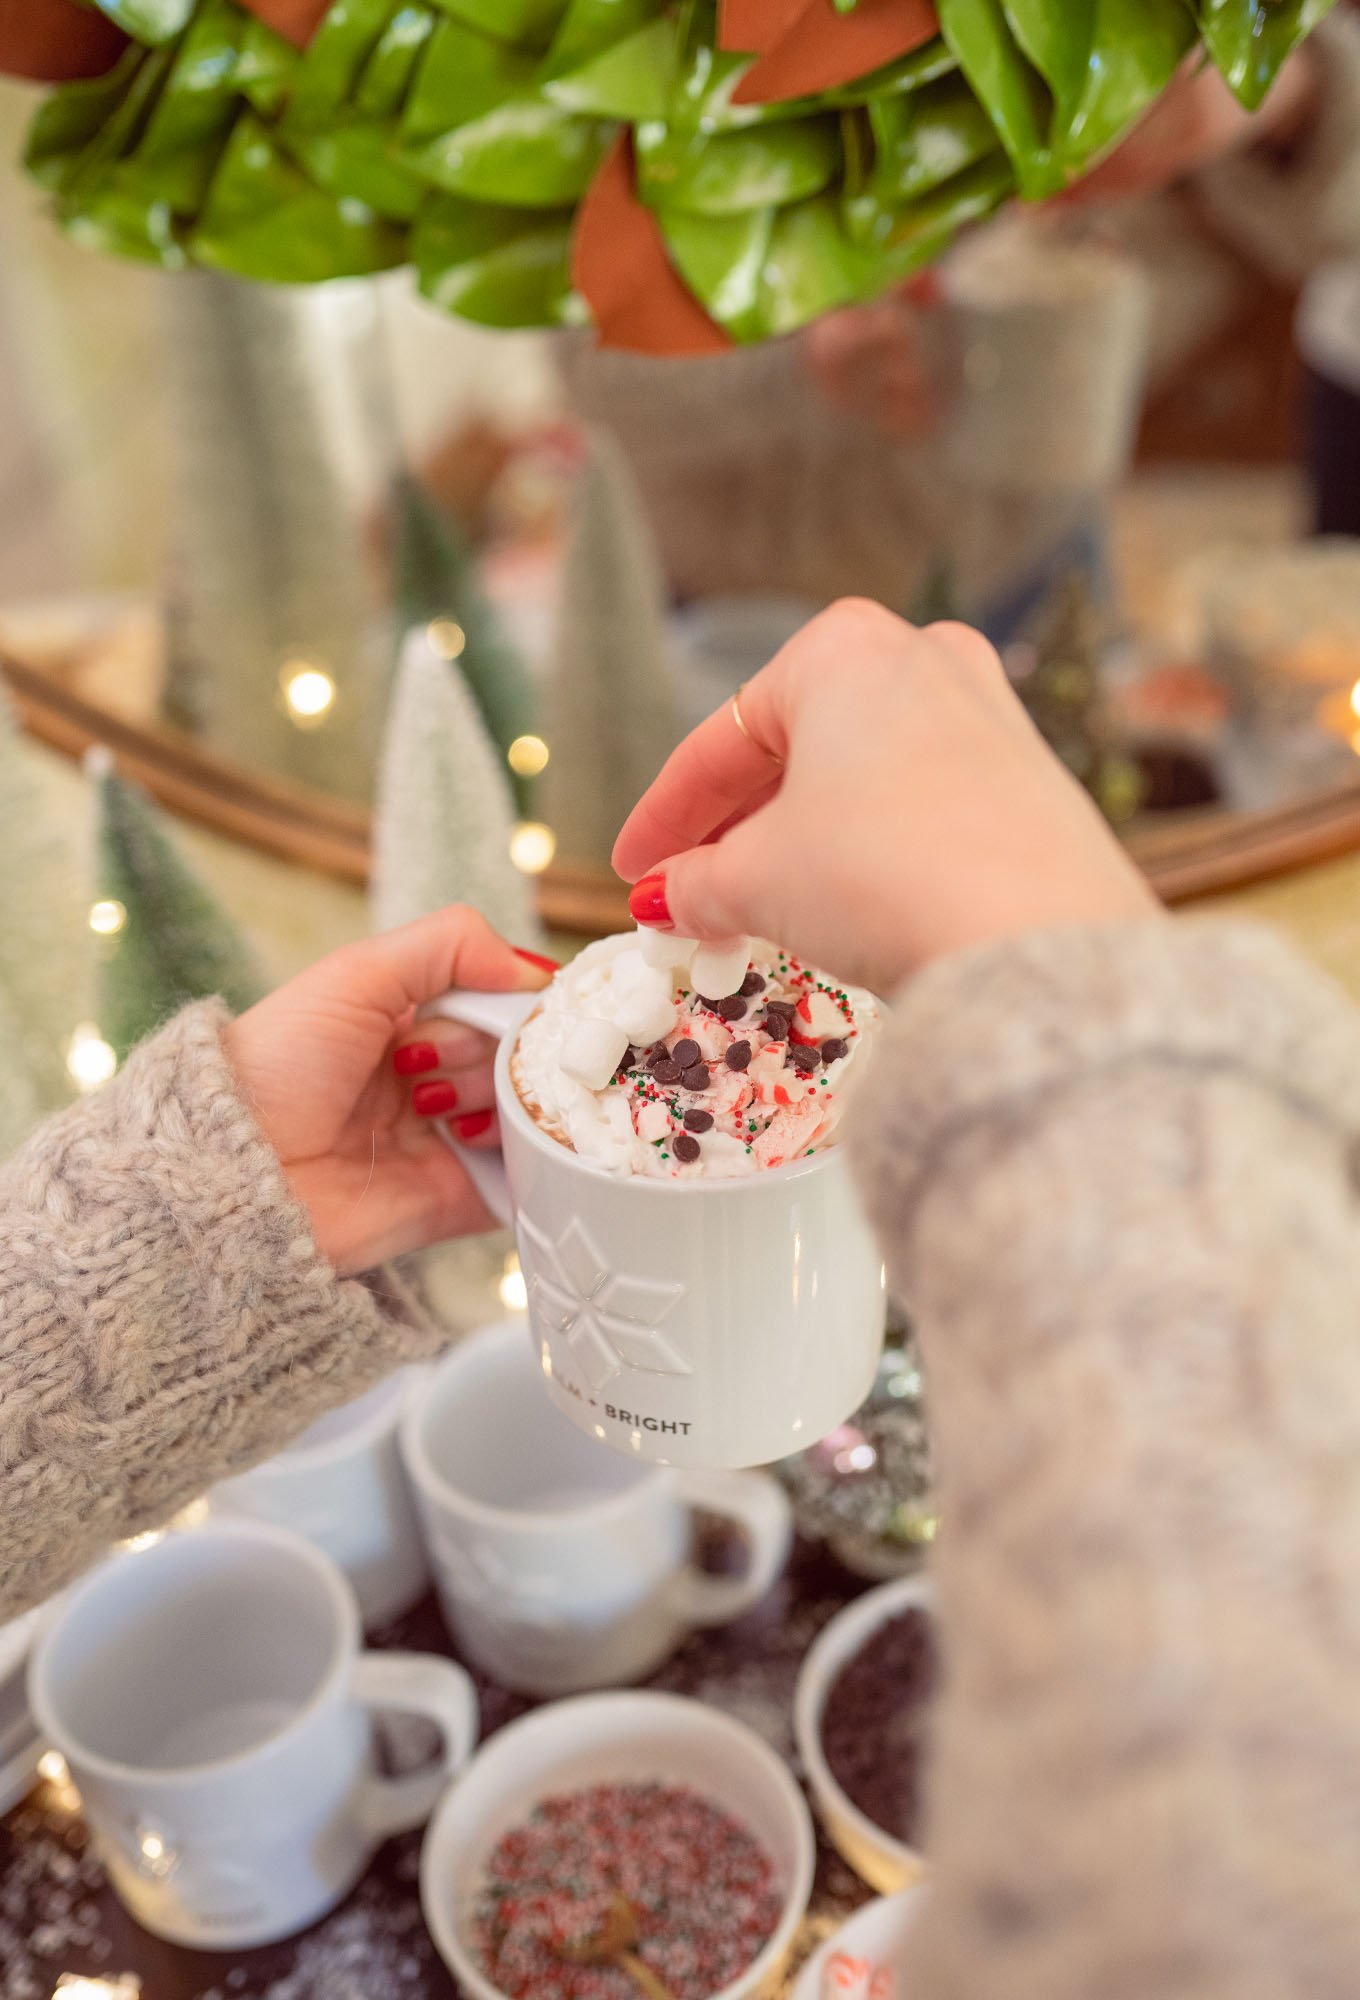 Ashley Brooke's hot cocoa bar including vegan hot chocolate recipe